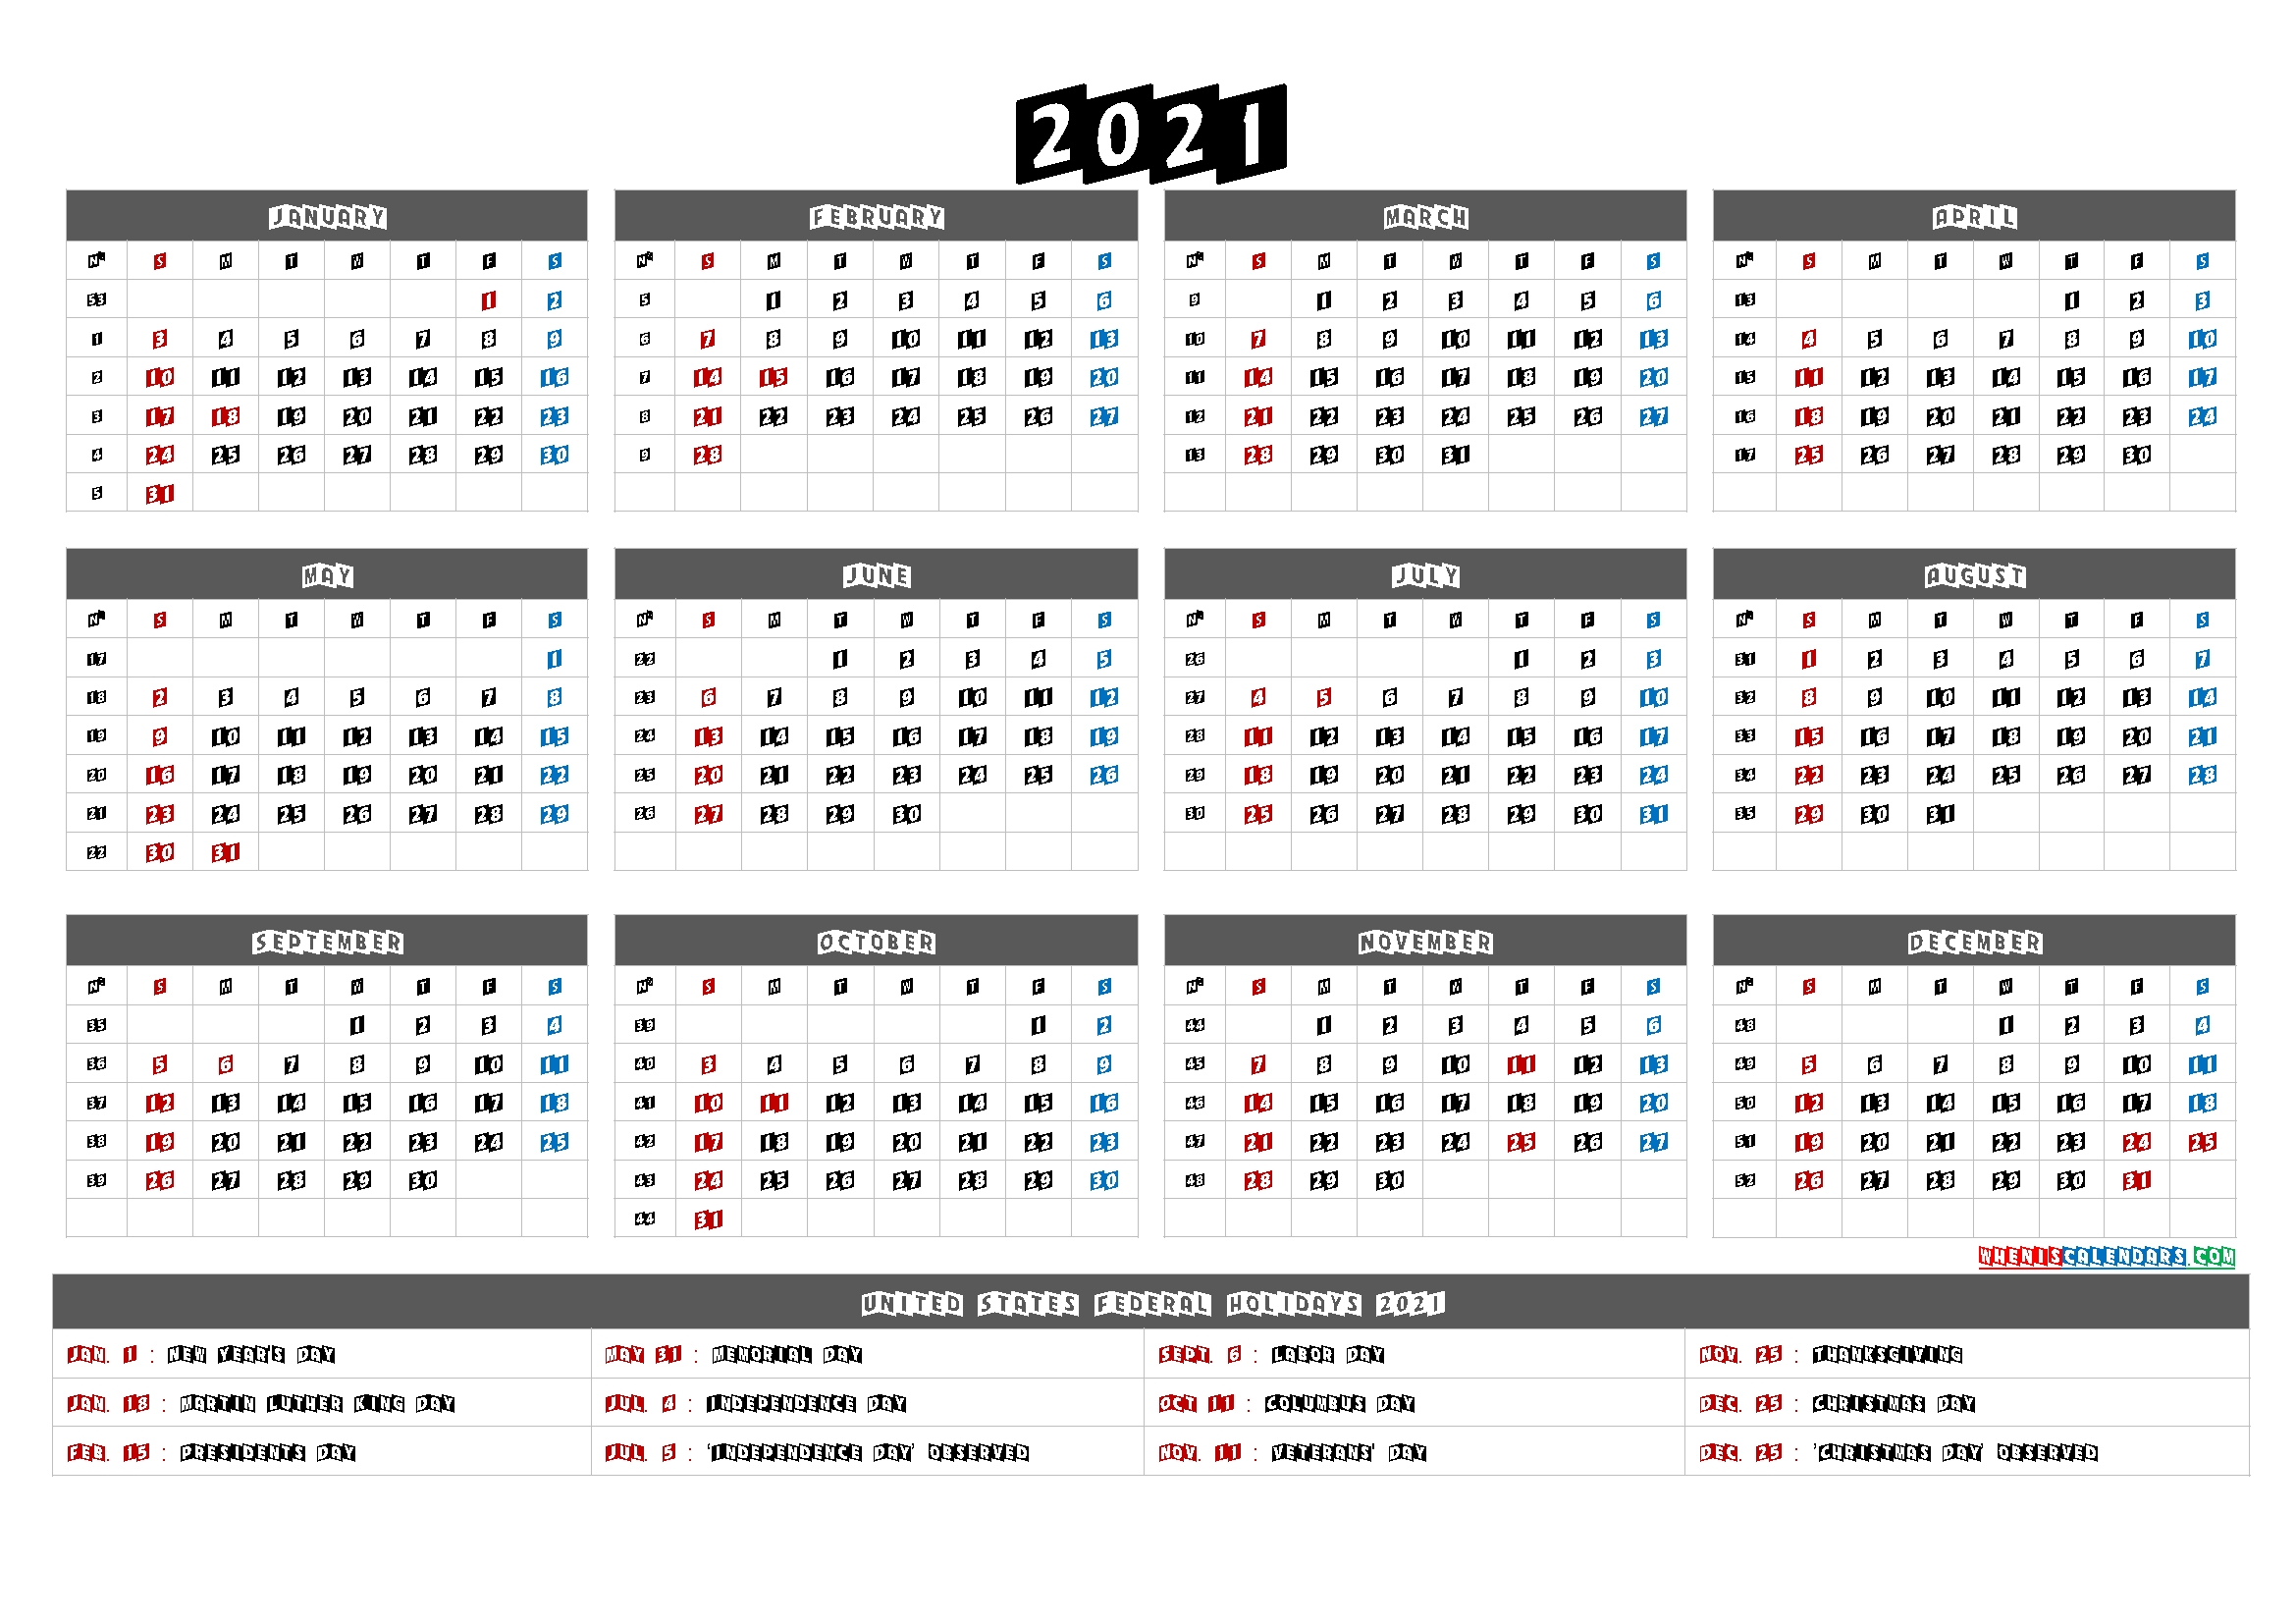 Printable 2021 Calendar One Page - 6 Templates | Free Printable 2020 Calendar With Holidays intended for 2021 Calendar Printable One Page